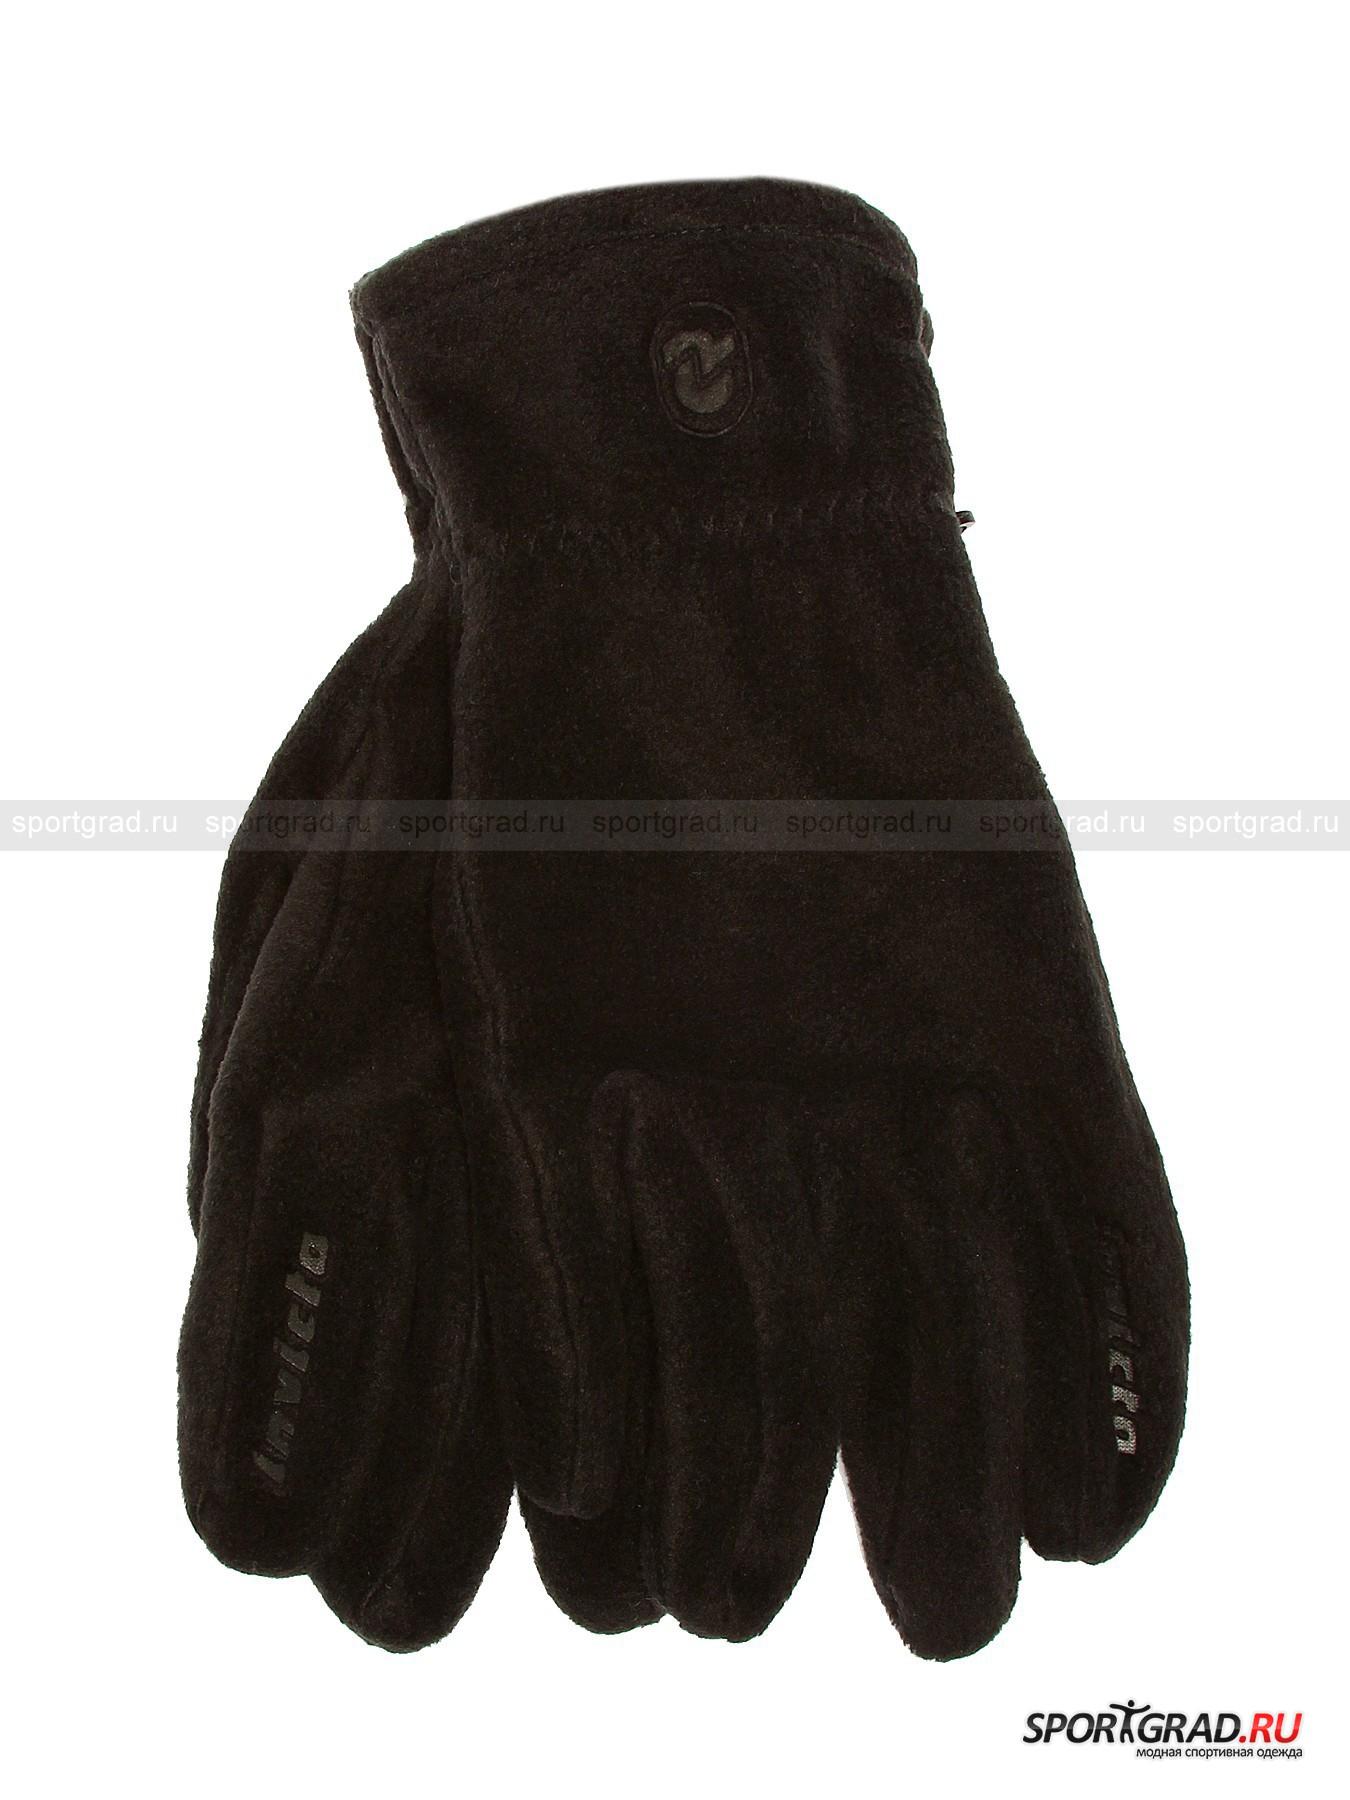 Перчатки из флиса Essential Pile INVICTA от Спортград